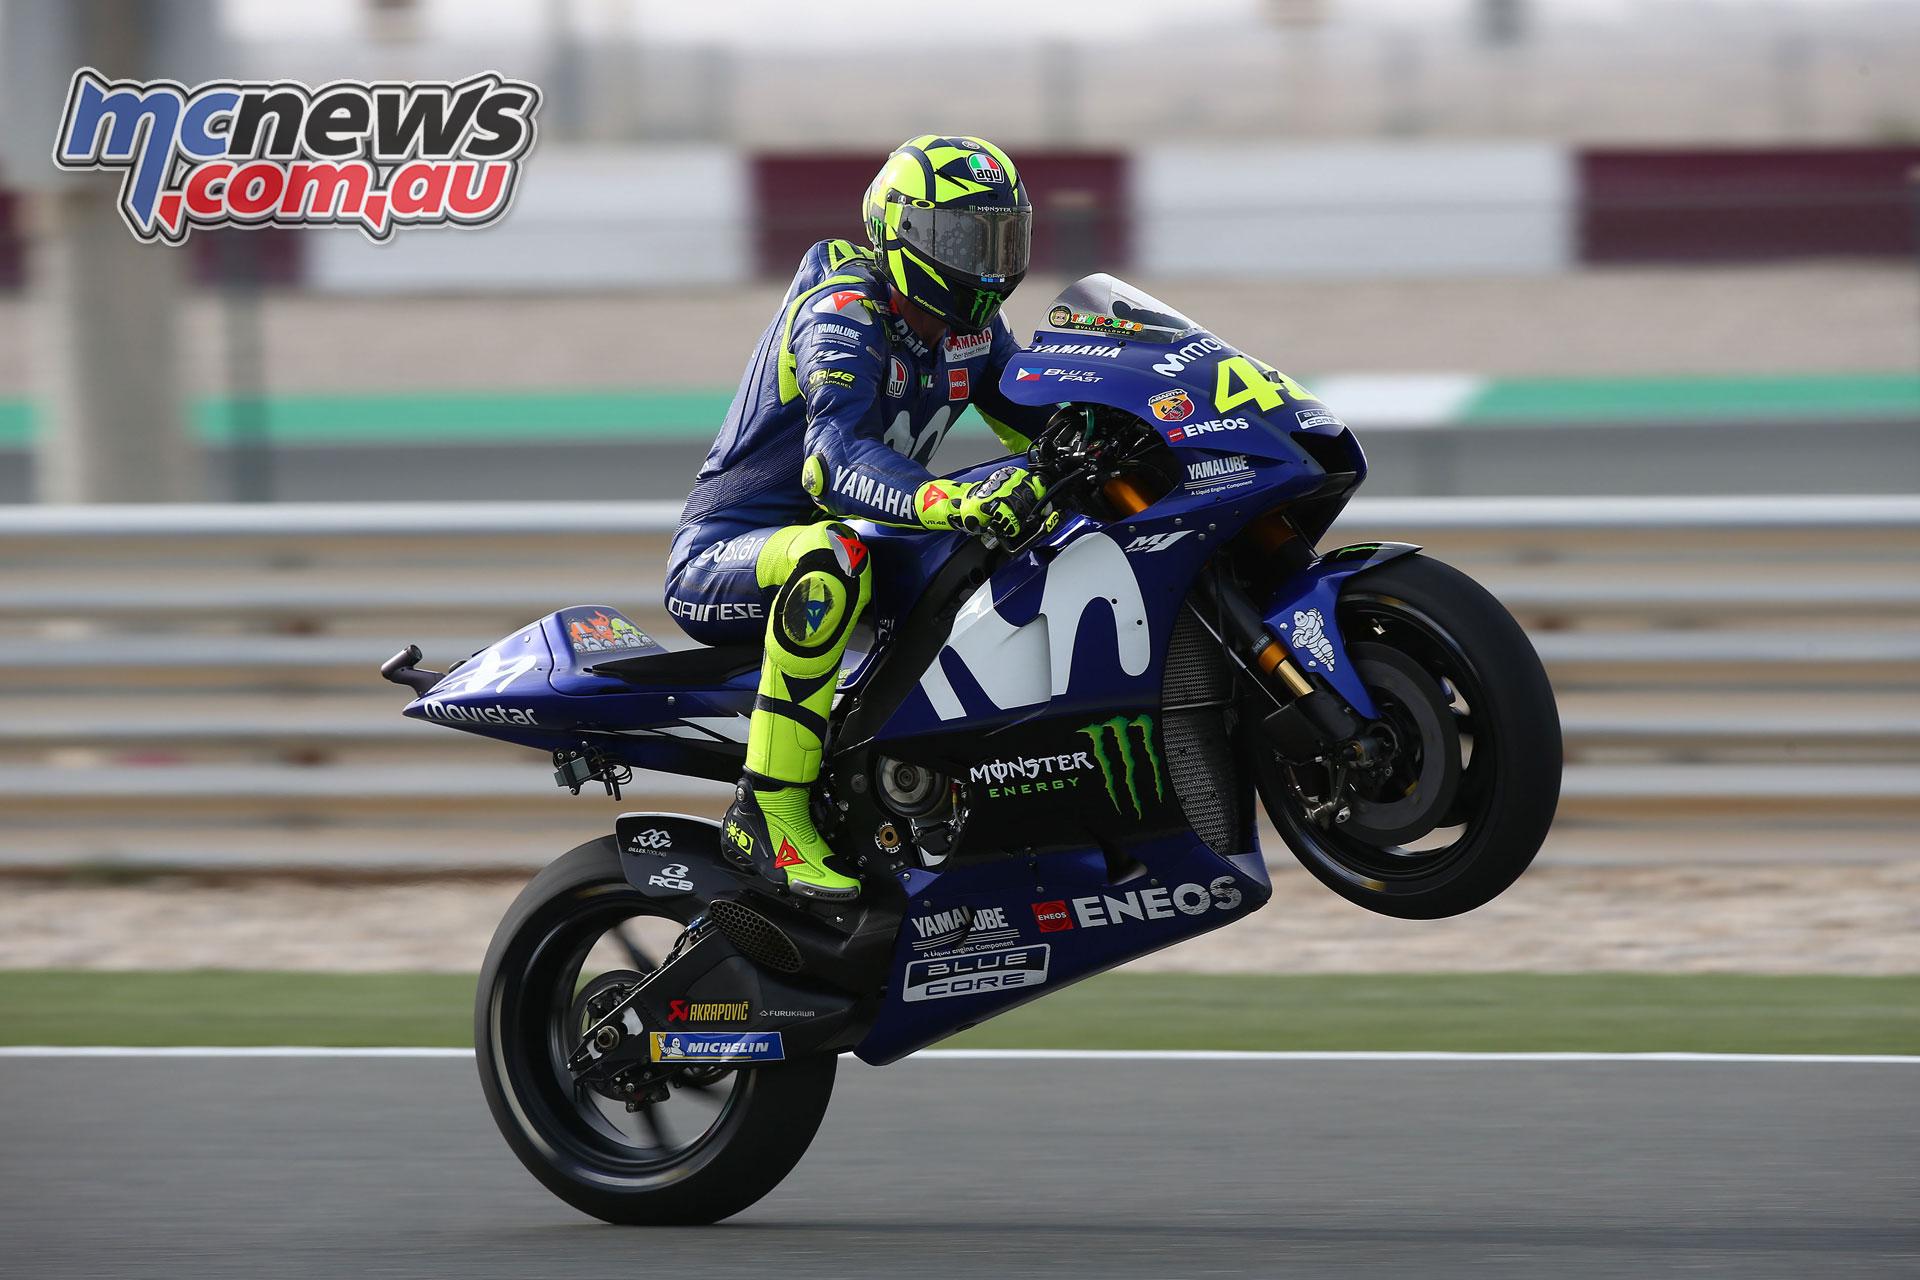 2018 Qatar MotoGP Images | Gallery B | MCNews.com.au